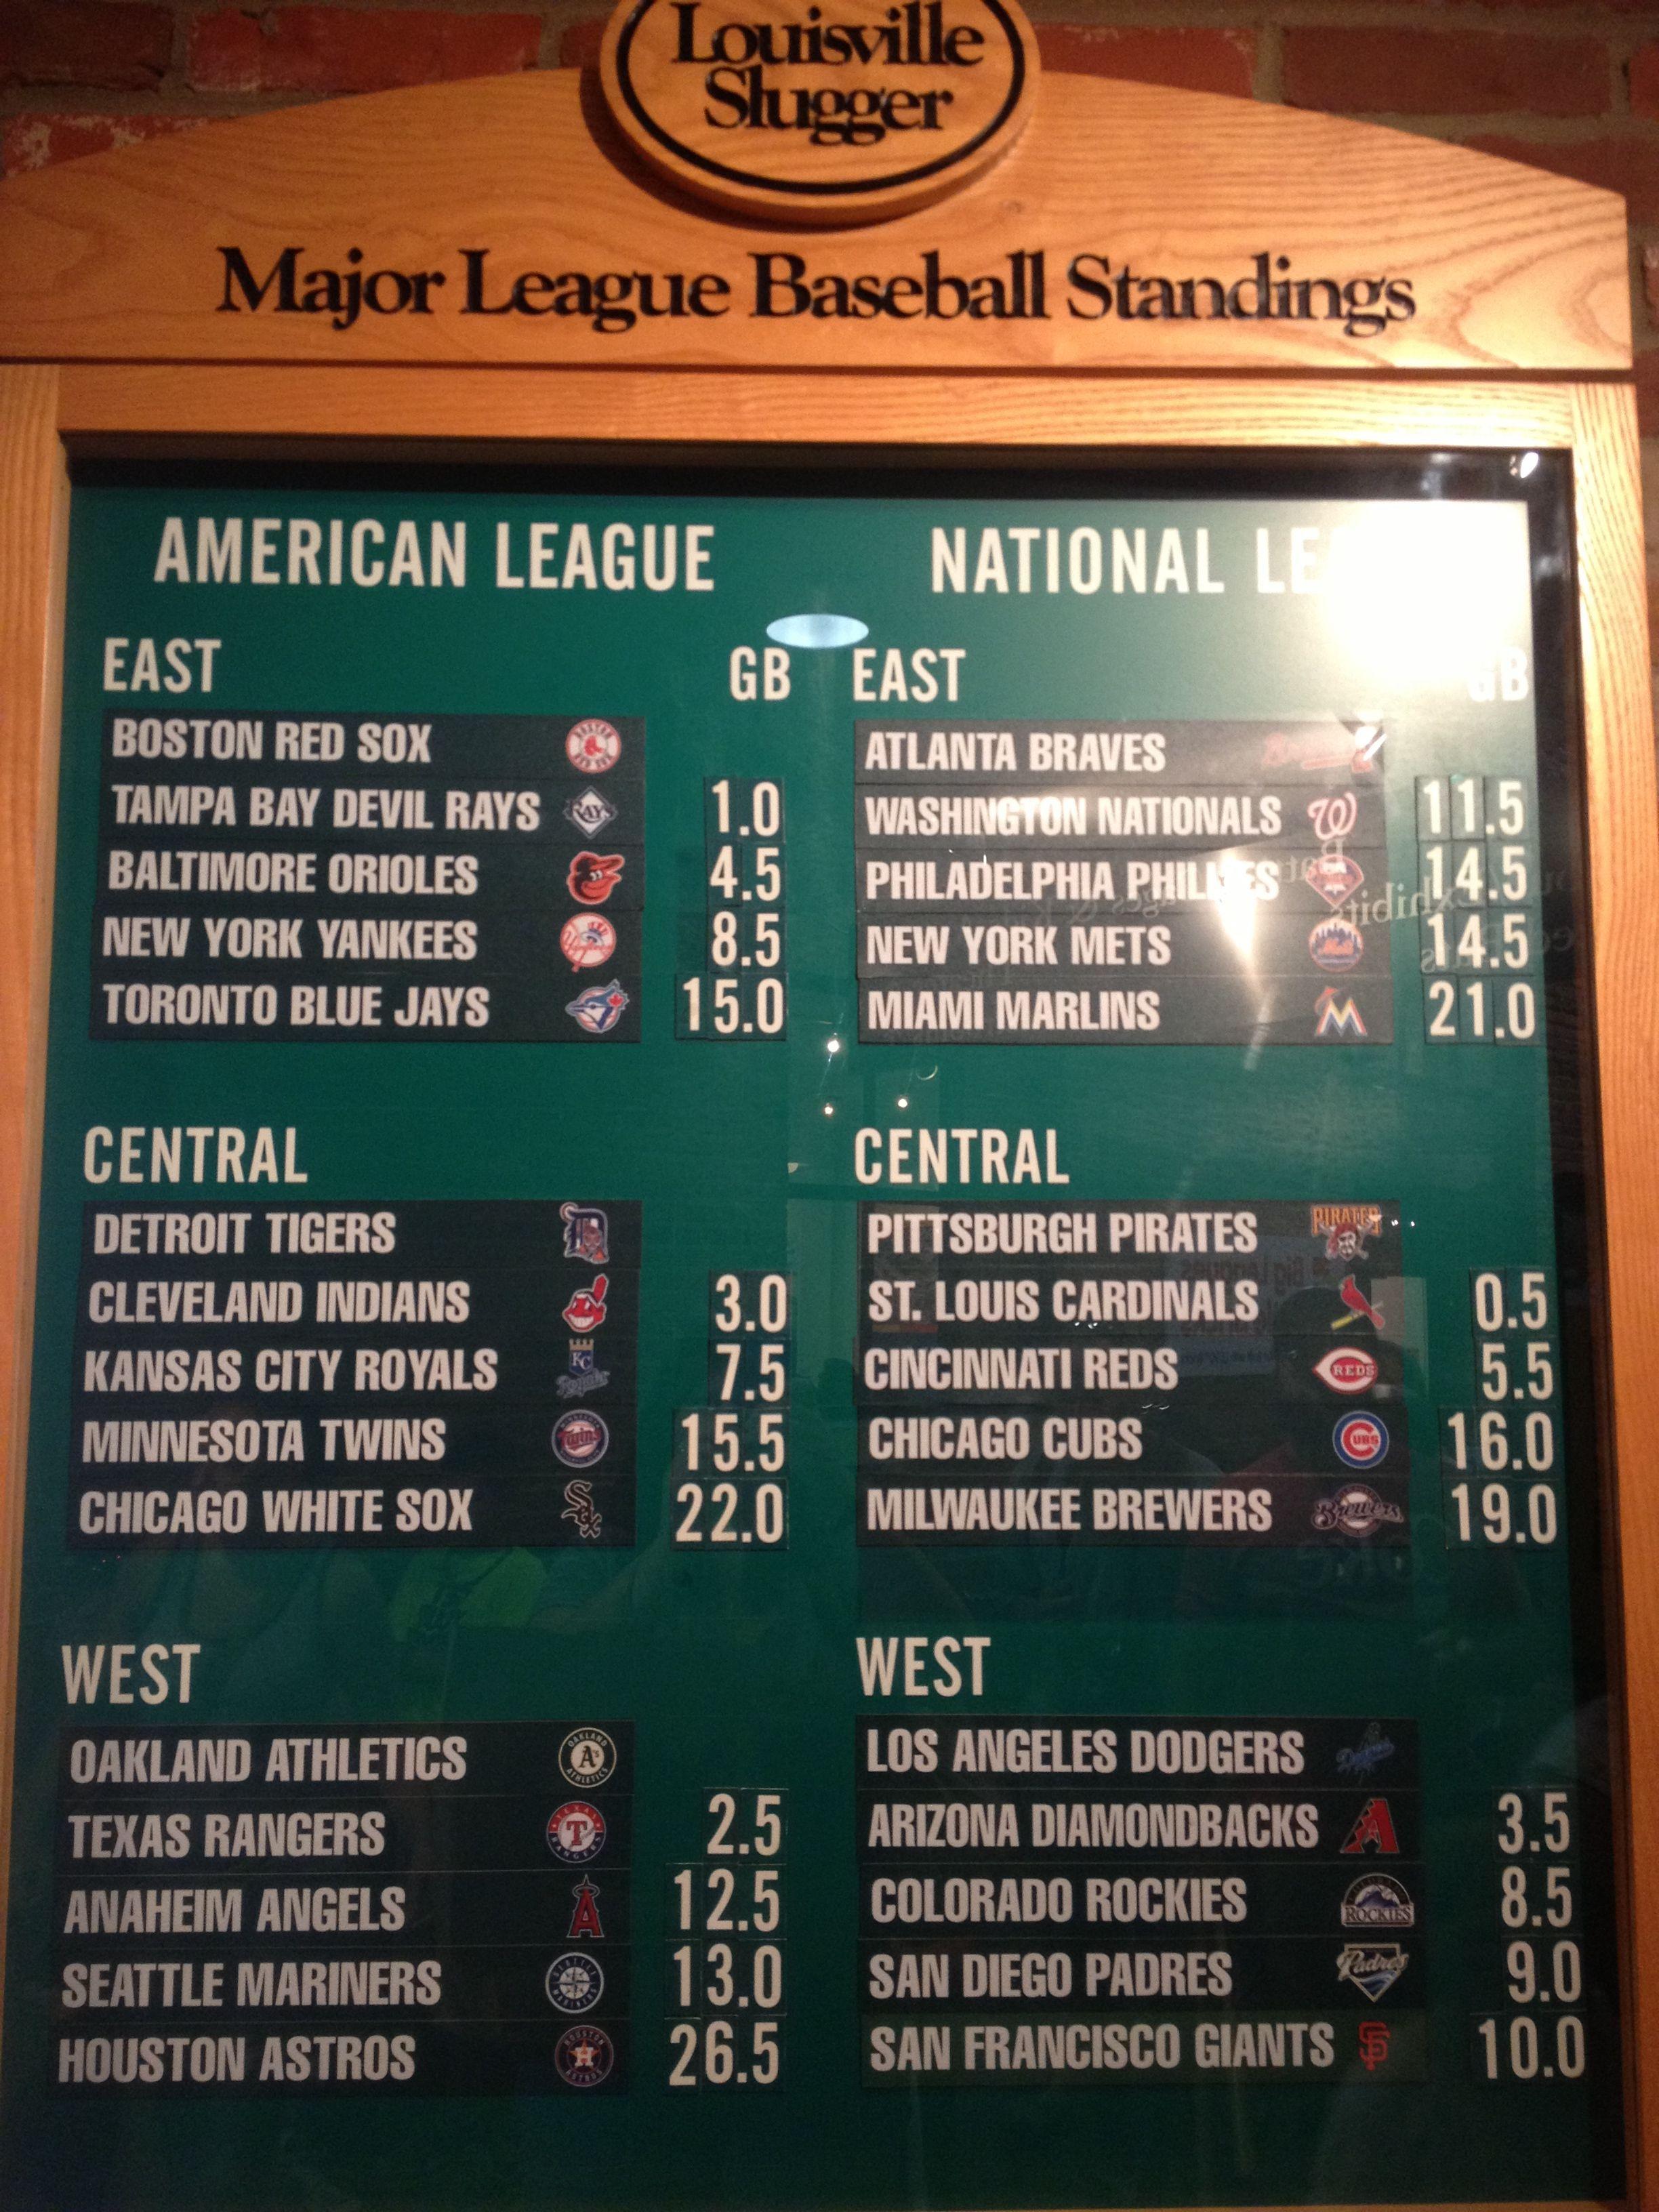 Mlb Standings Board Aug 3rd Mlbstandings Mlb Standings Baseball Scoreboard Backyard Baseball